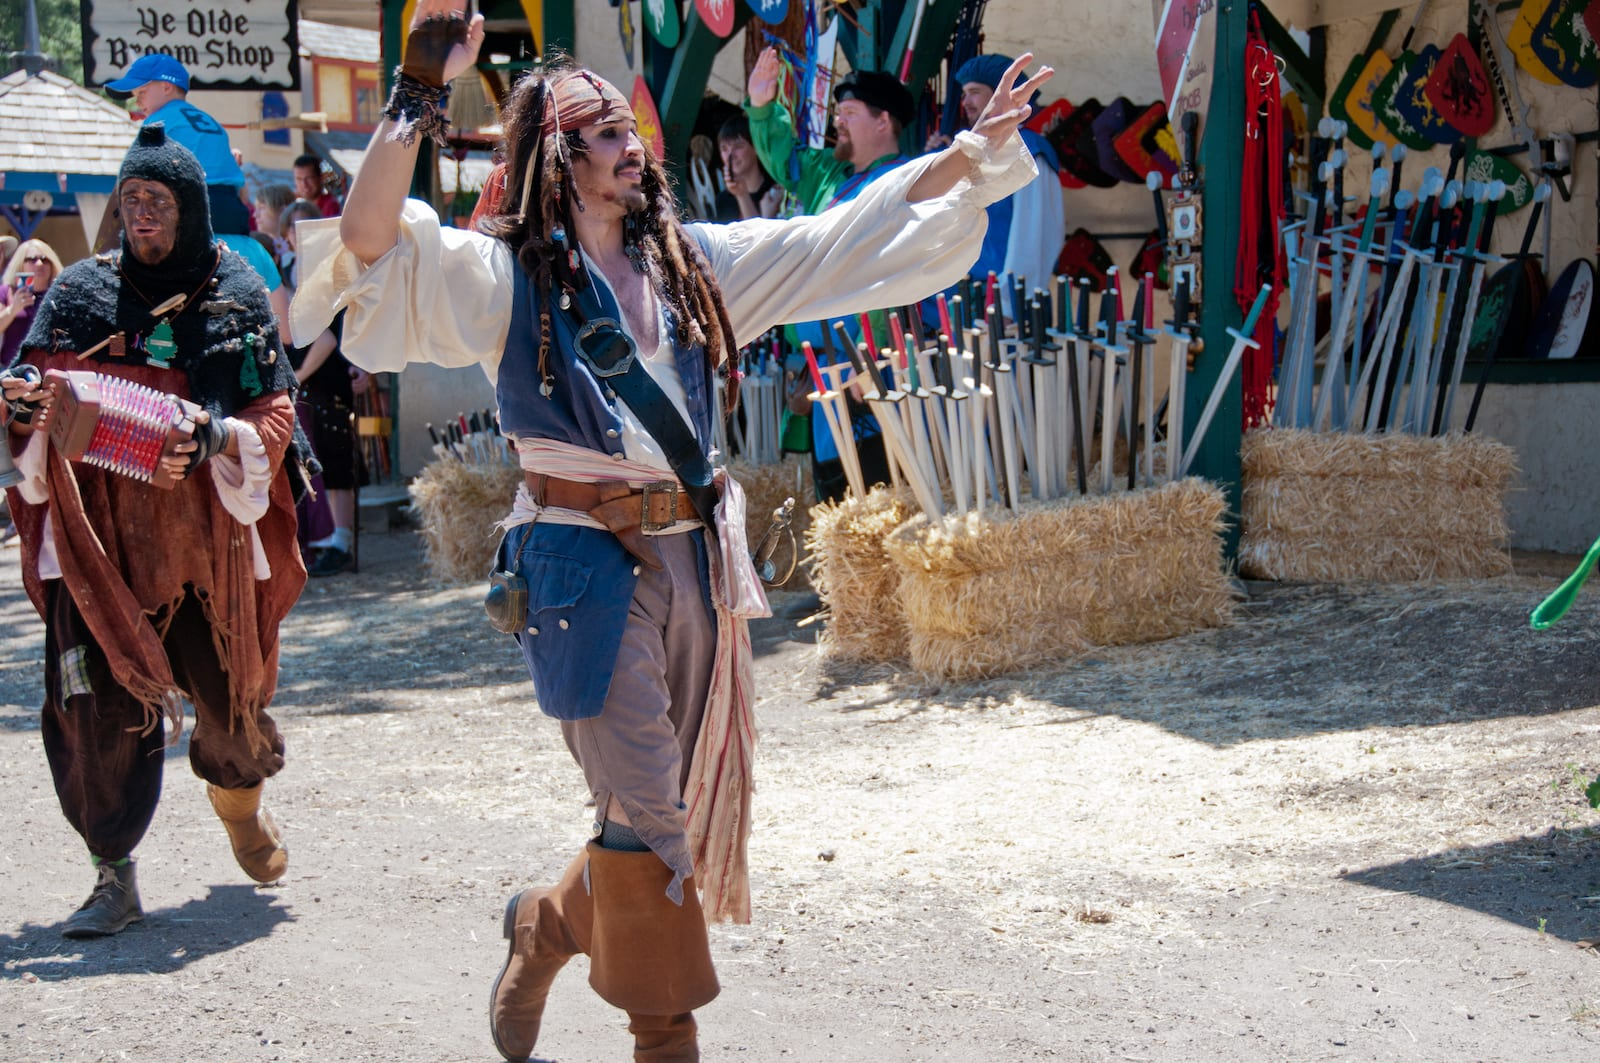 Colorado Renaissance Festival Captain Jack Sparrow Pirate